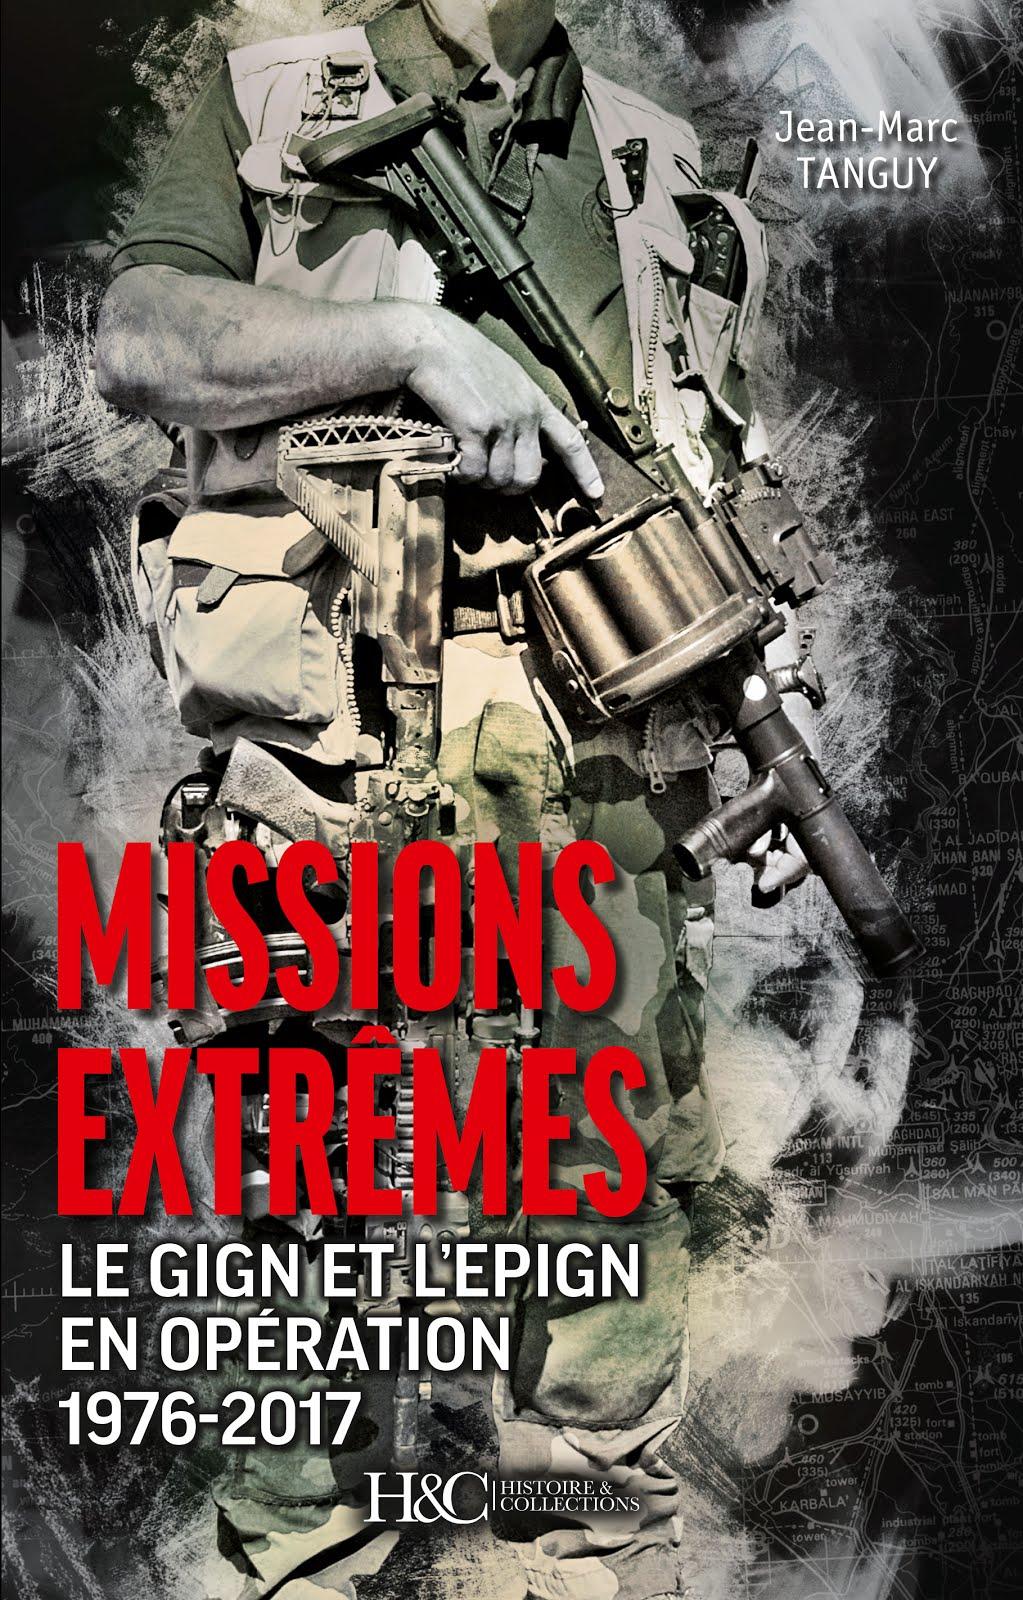 Mission extrêmes, GIGN et EPIGN en opérations 1976-2017